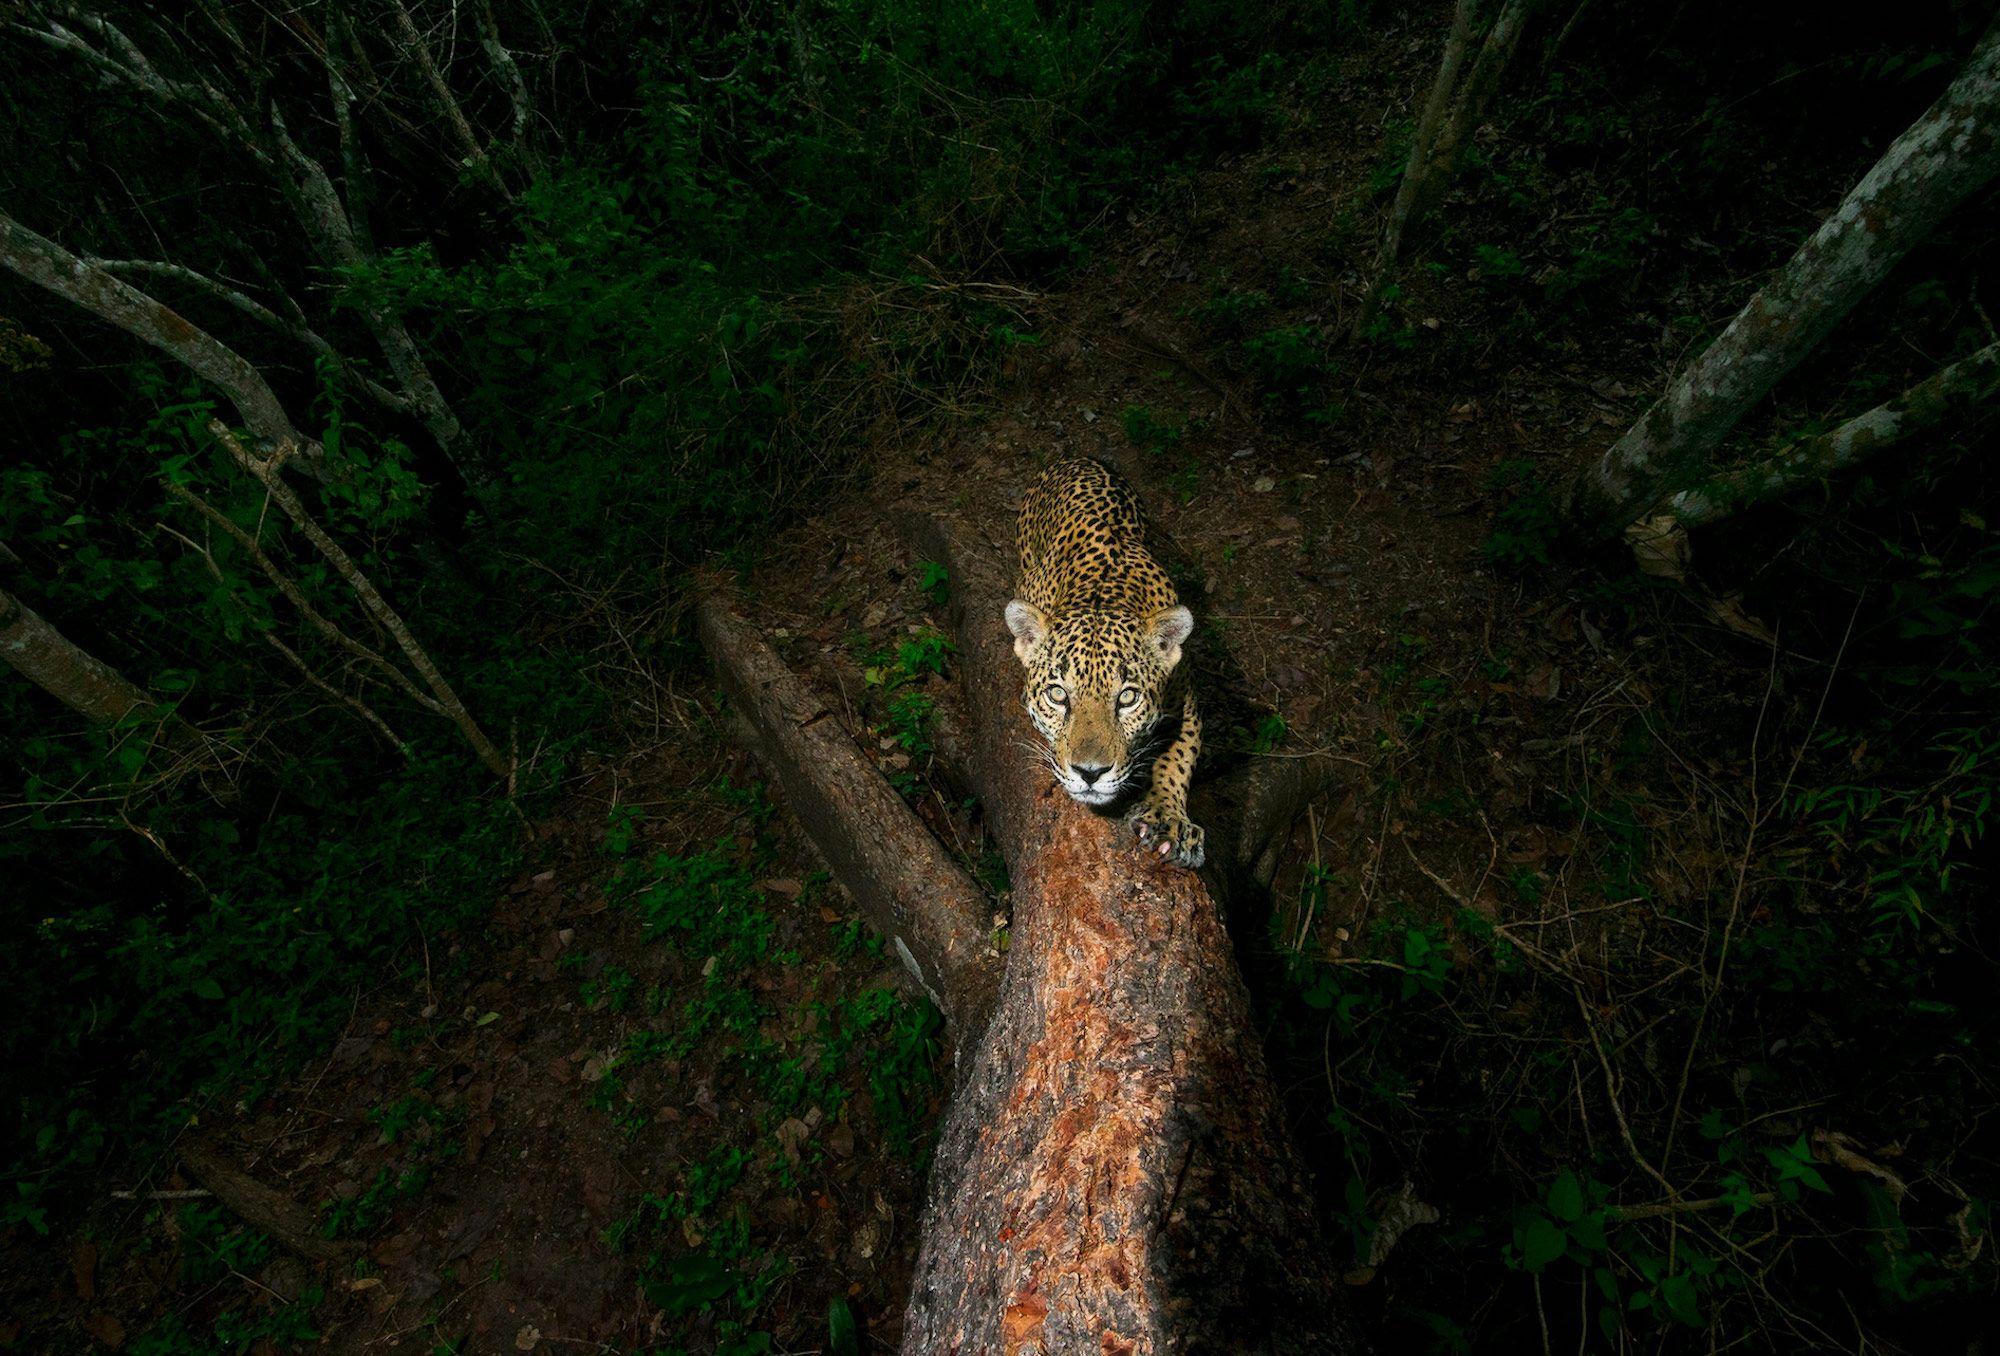 Wildlife photographer of the year 2018 photo